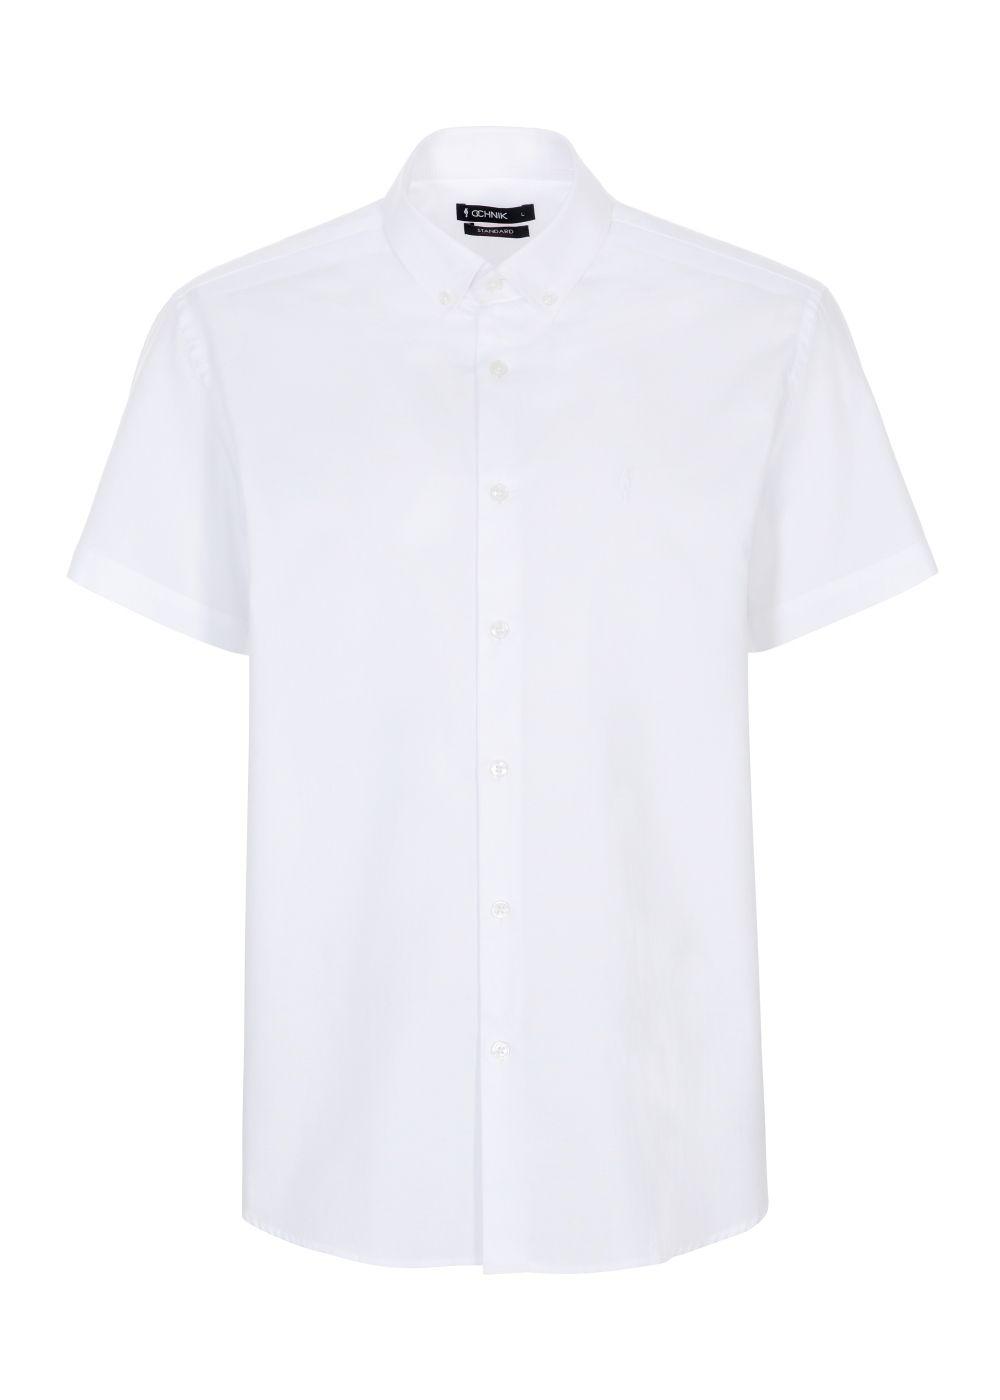 Koszula męska KOSMT-0258-11(W21)